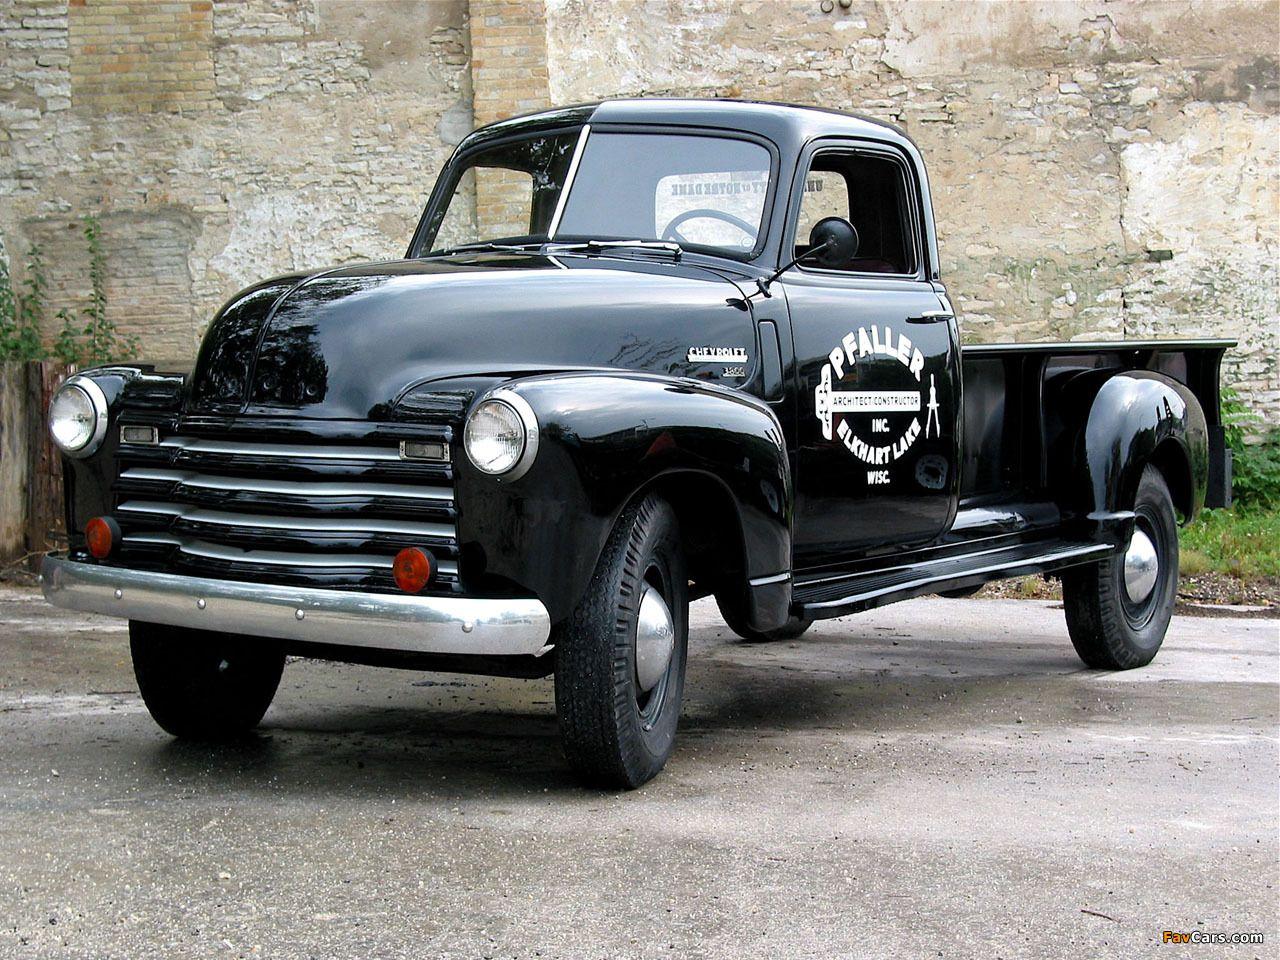 1950 Chevy 3800 Pickup Truck | CHEVROLET PICKUP | Pinterest ...